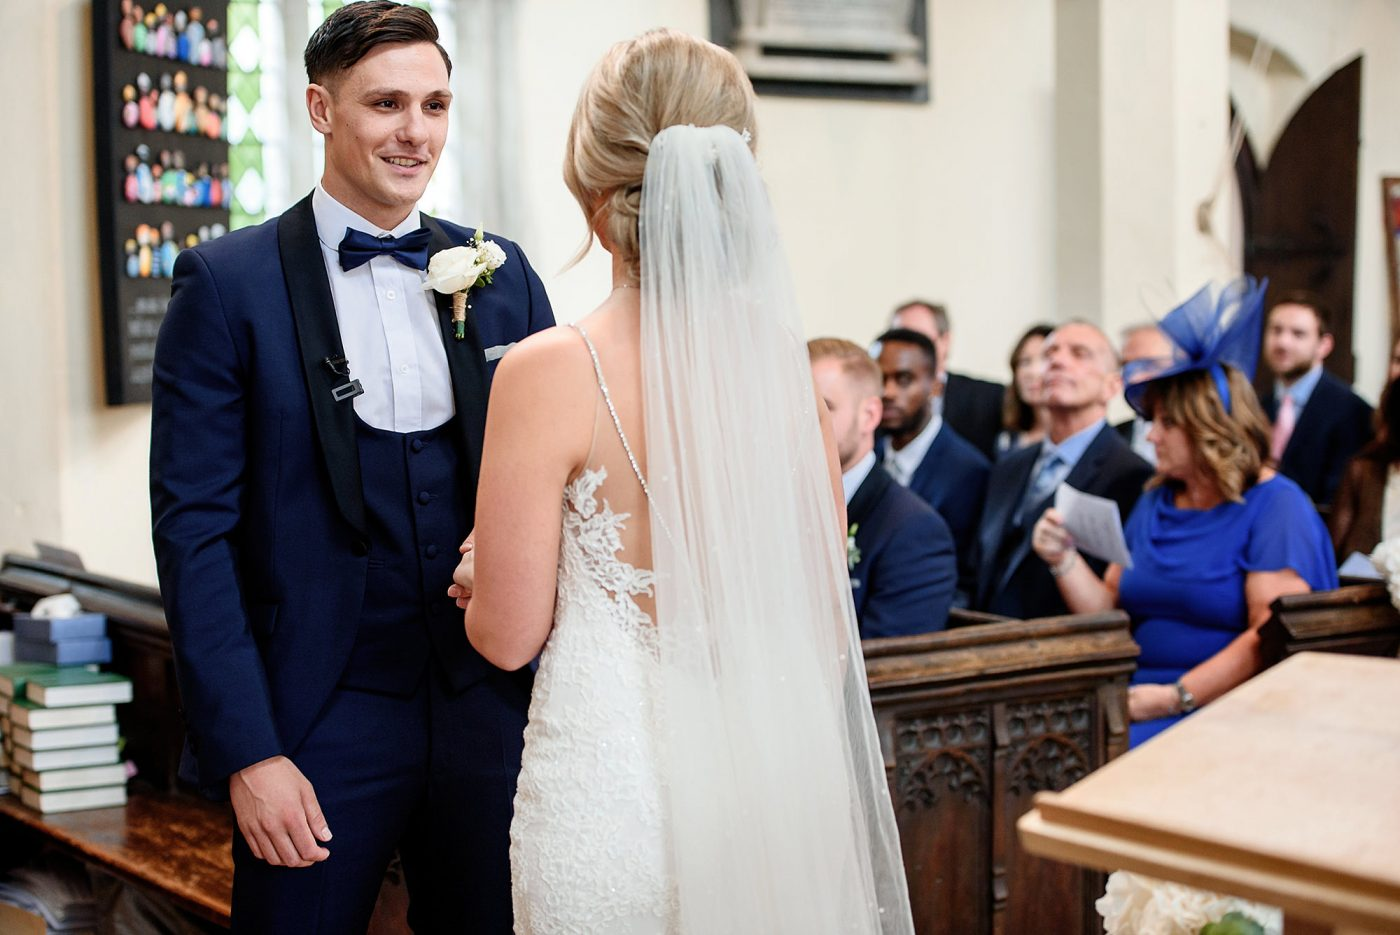 wedding ceremony at st marys church